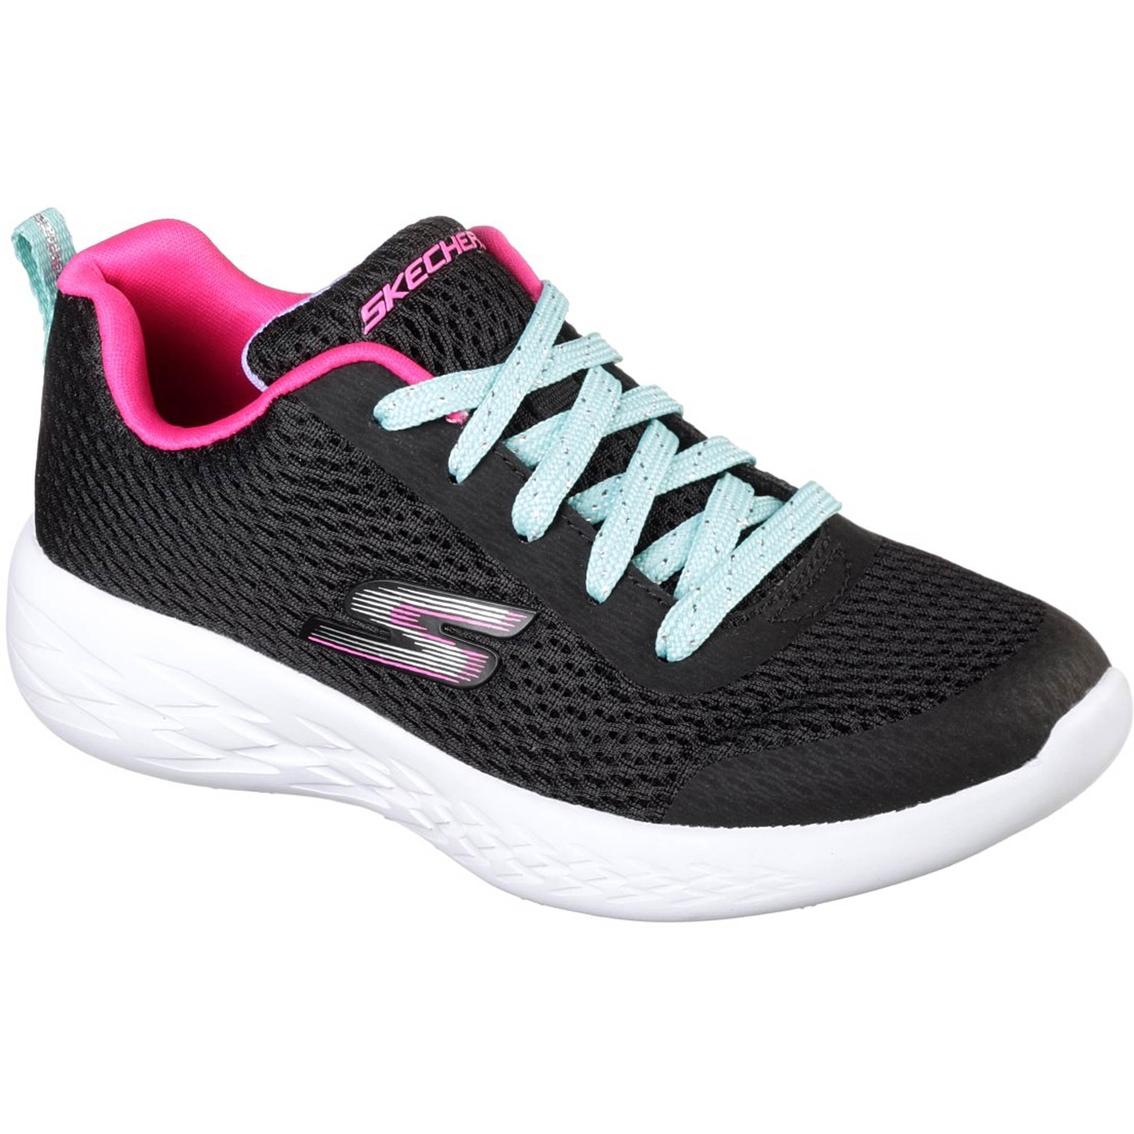 Skechers Girls Fun Run Lightweight Lace Sneakers